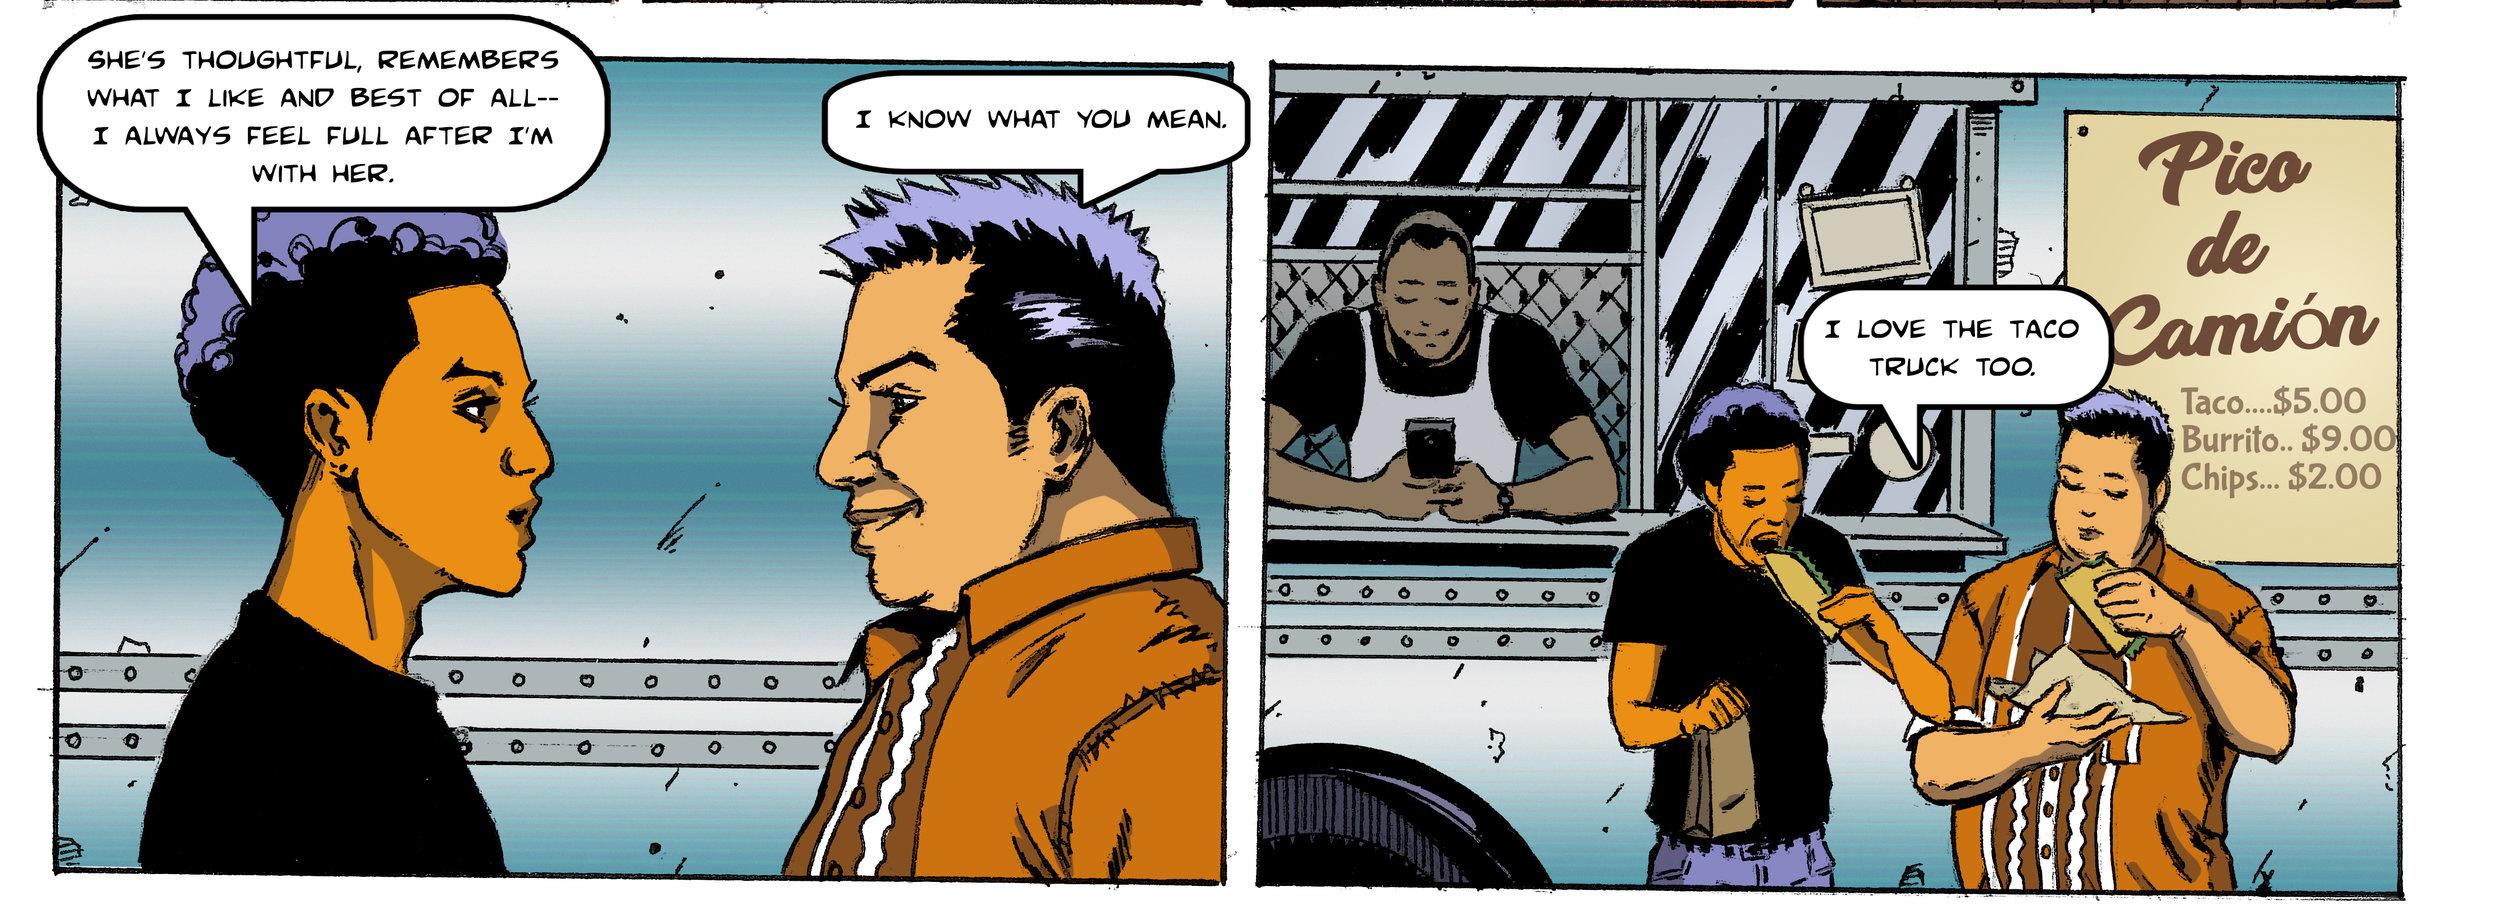 (H)af Comic Strip #86.jpg